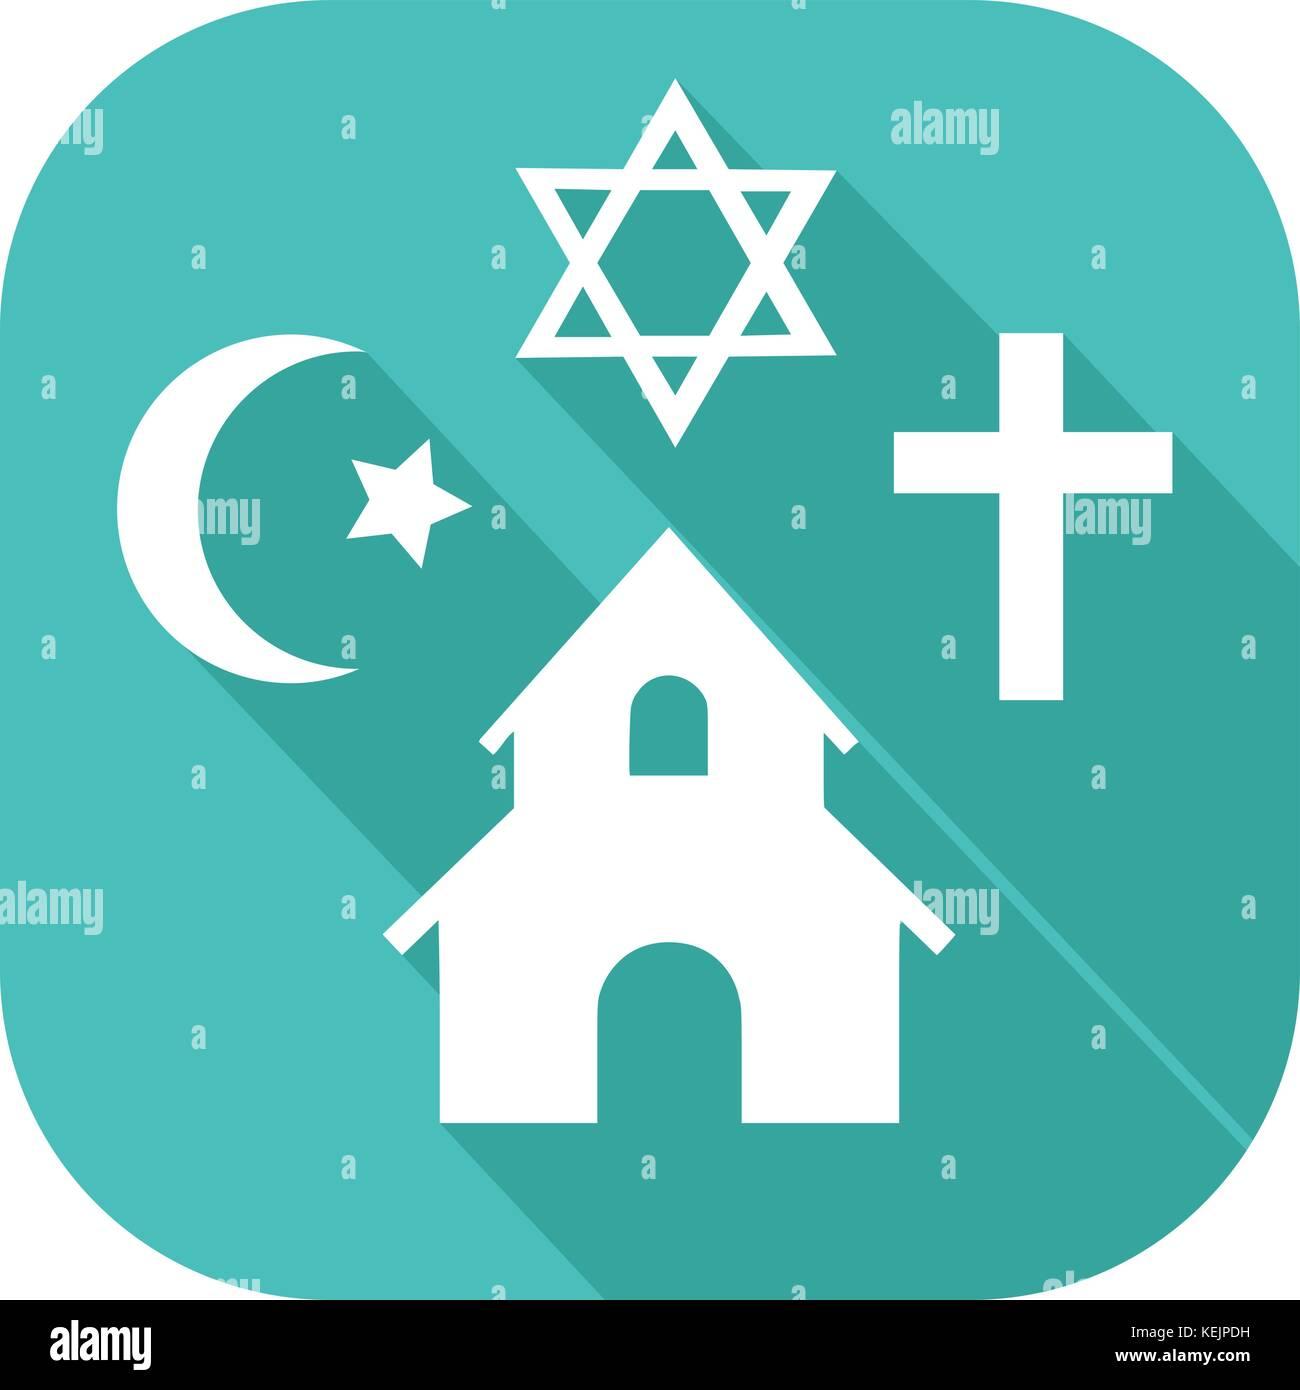 Symbols Icon Of Different Religions Stock Vector Art Illustration